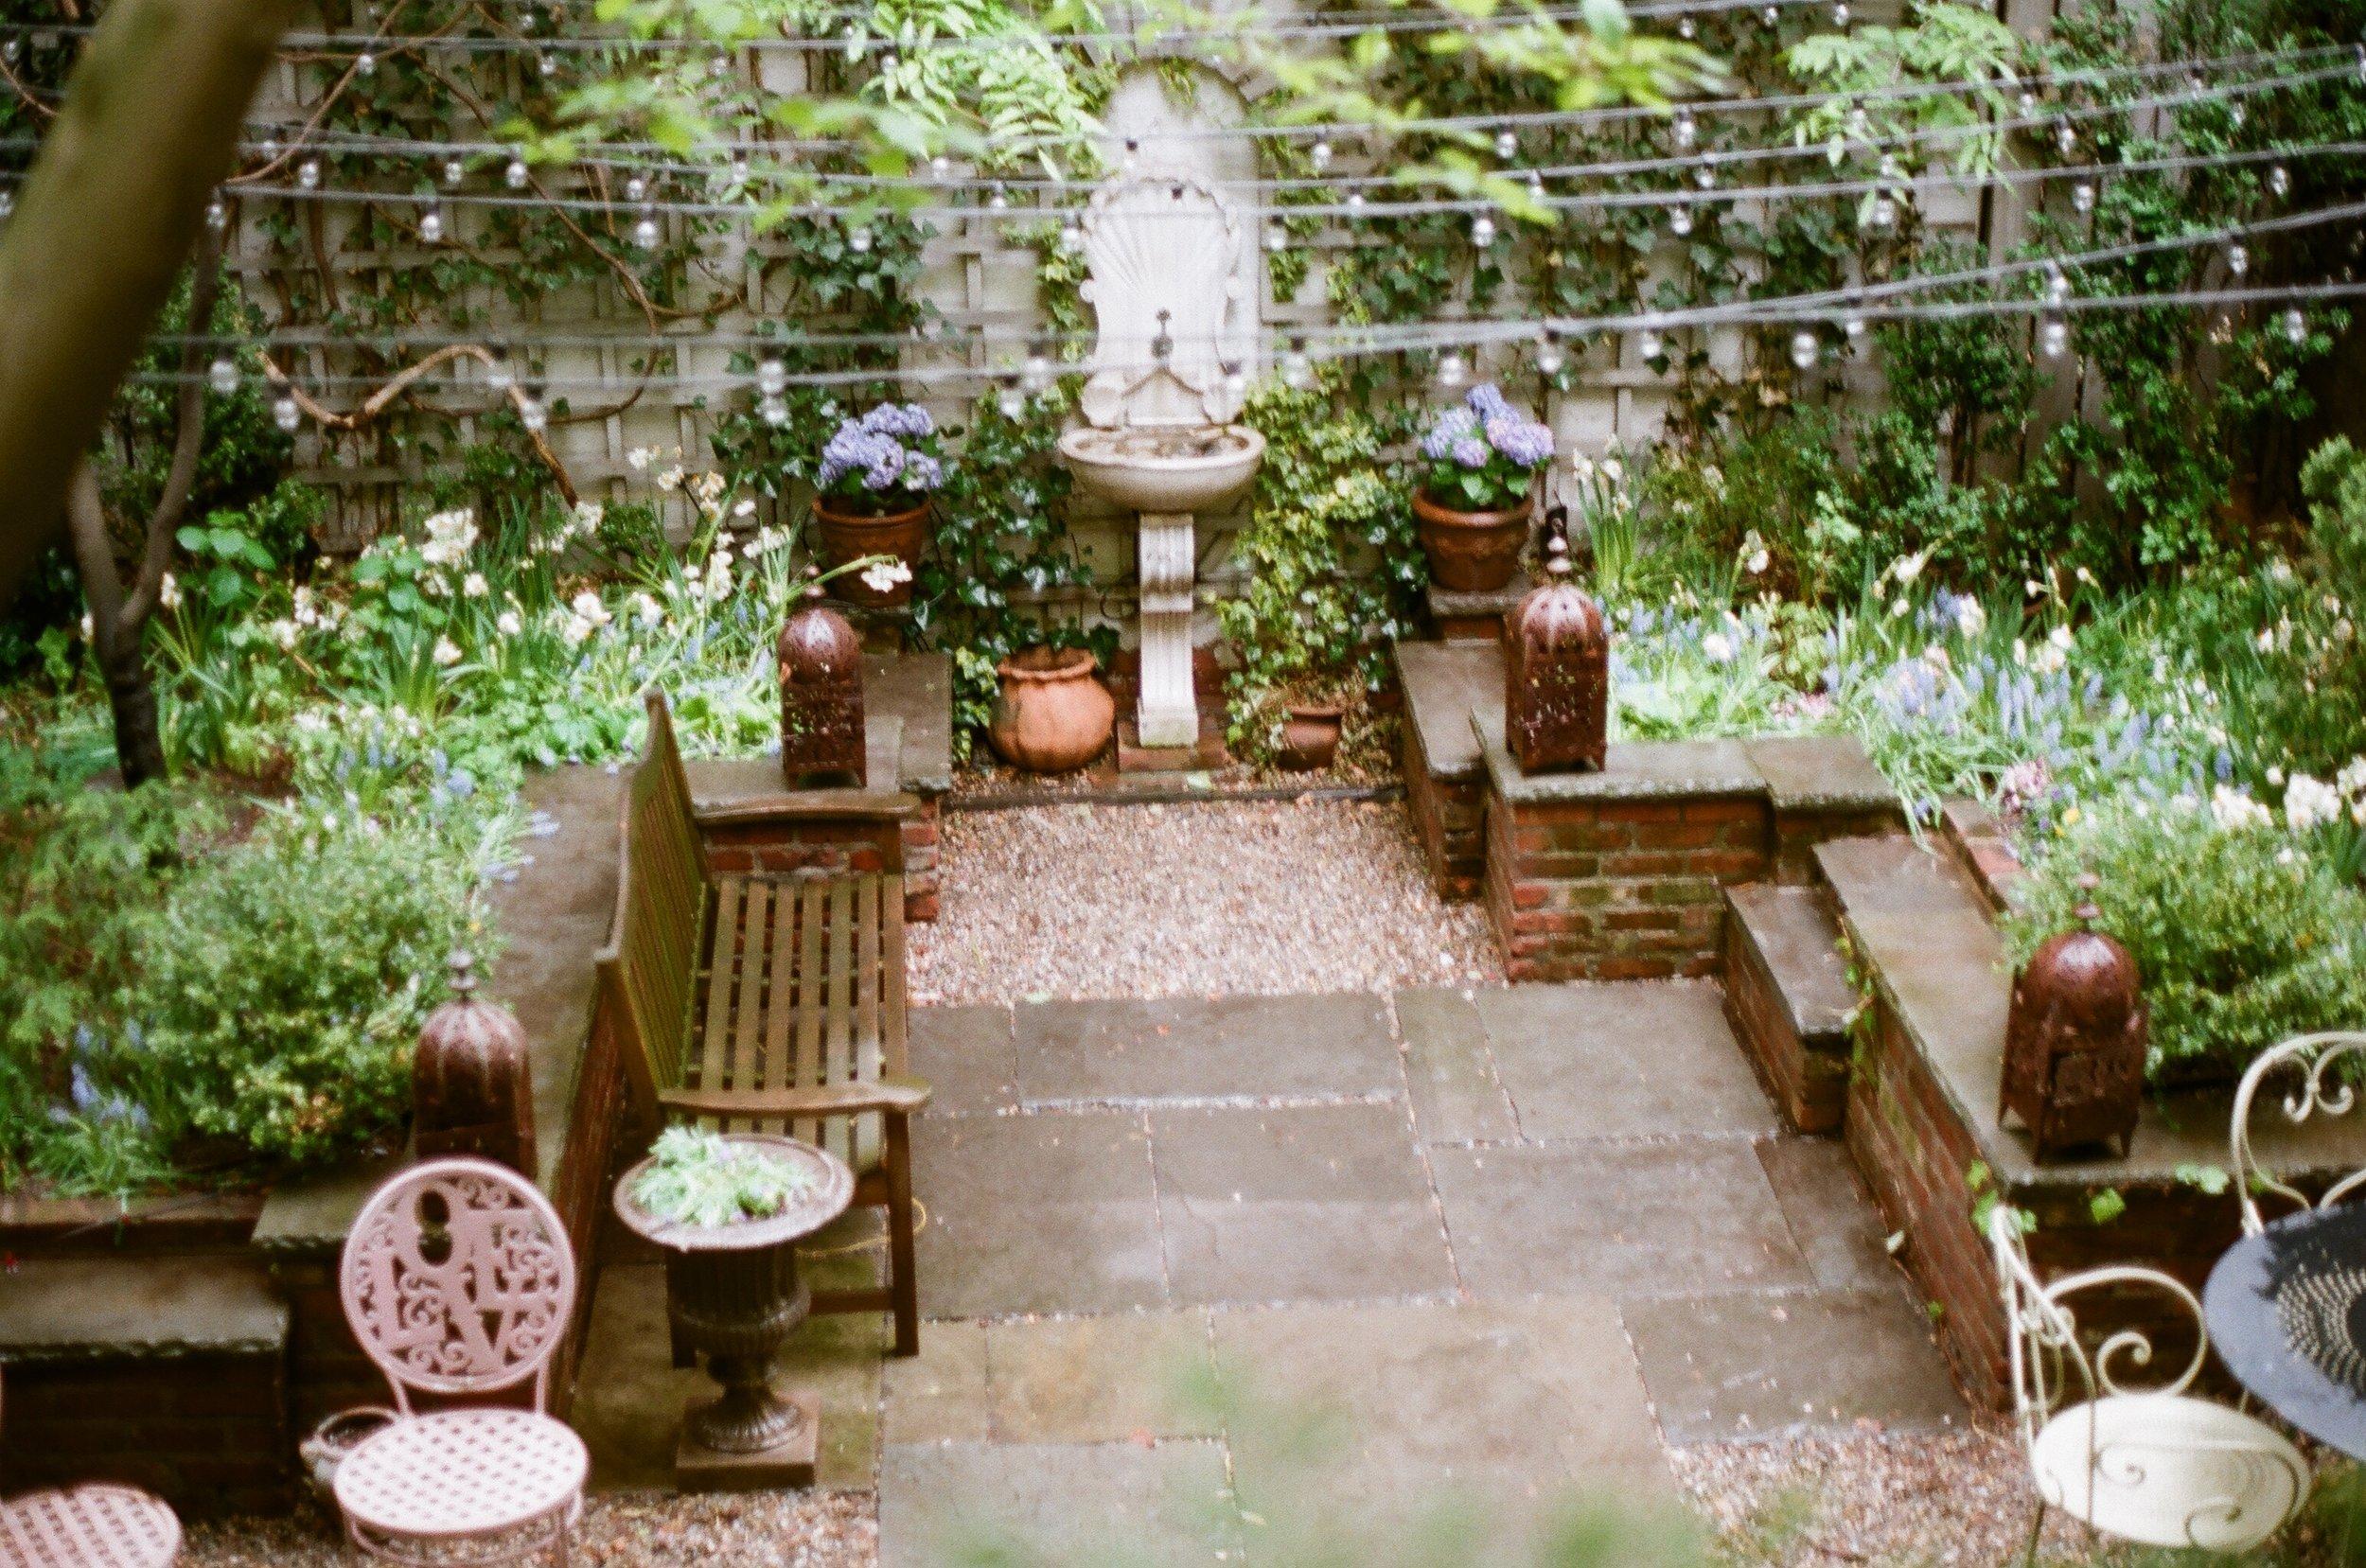 brooklyn_plant_studio_garden_4.jpg